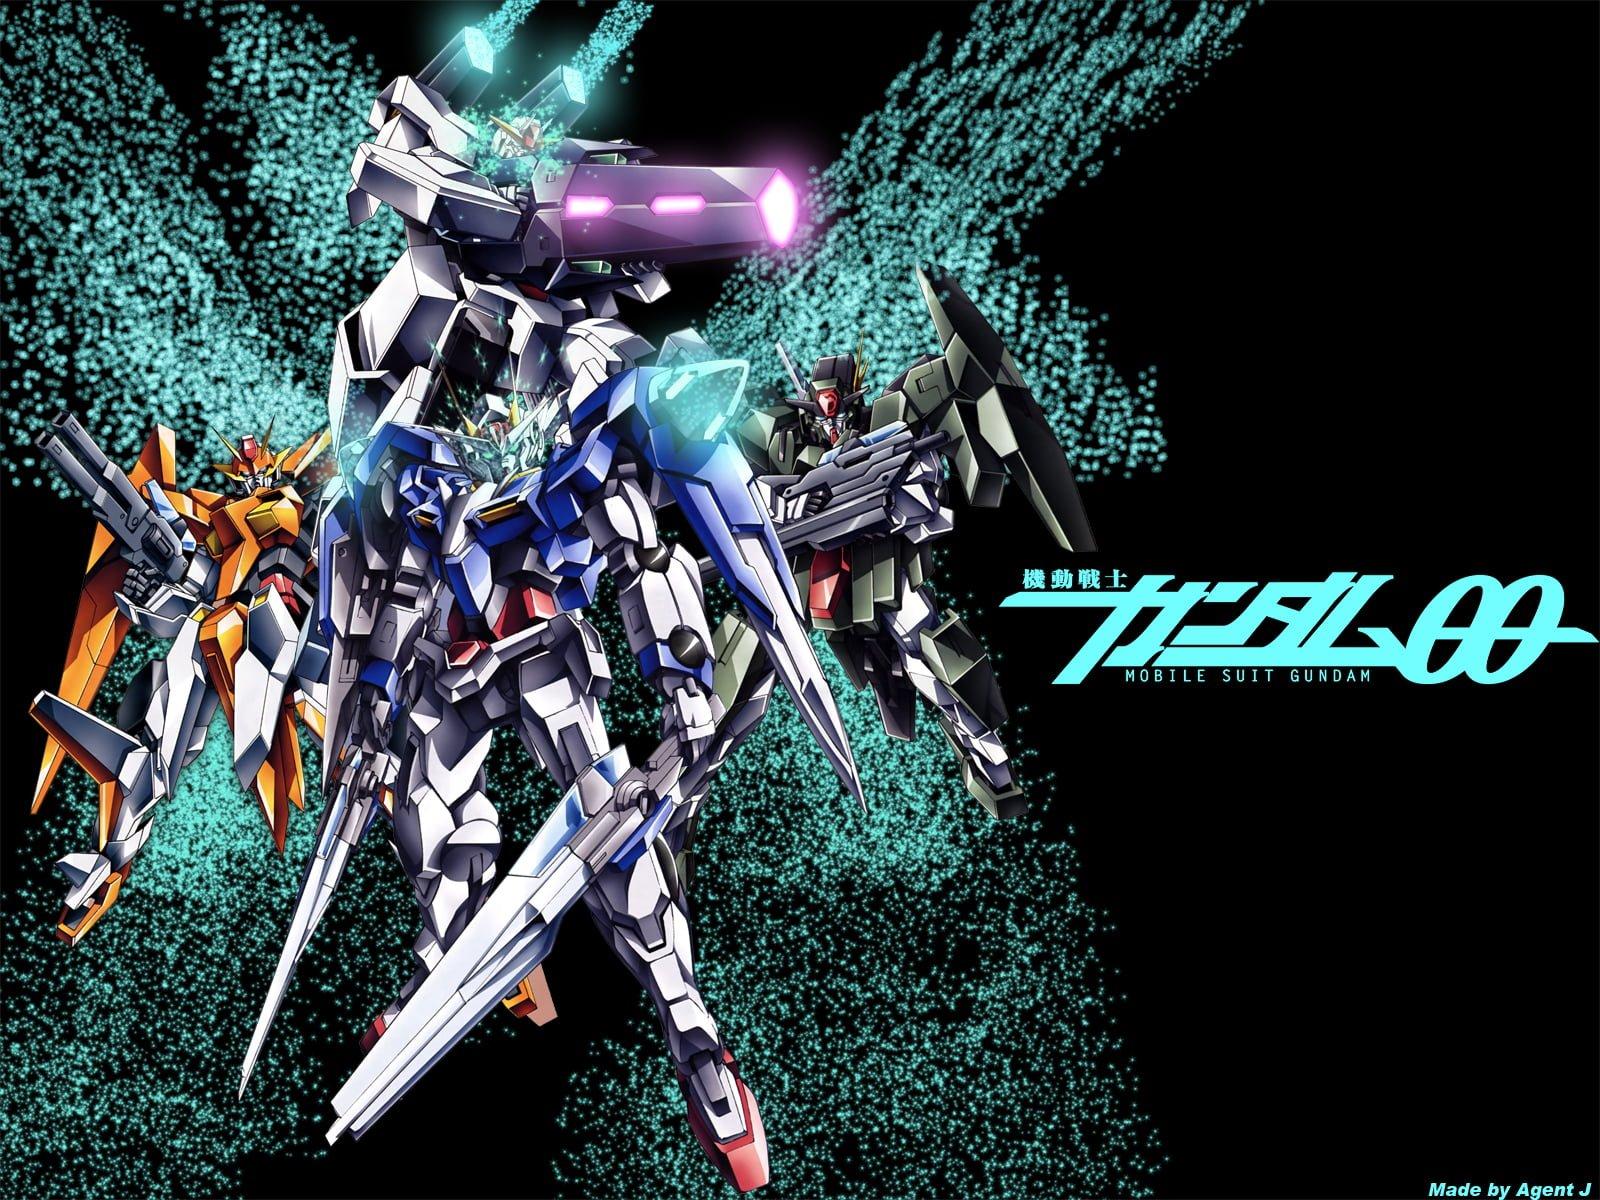 Gundam OO กันดั้มดับเบิลโอ